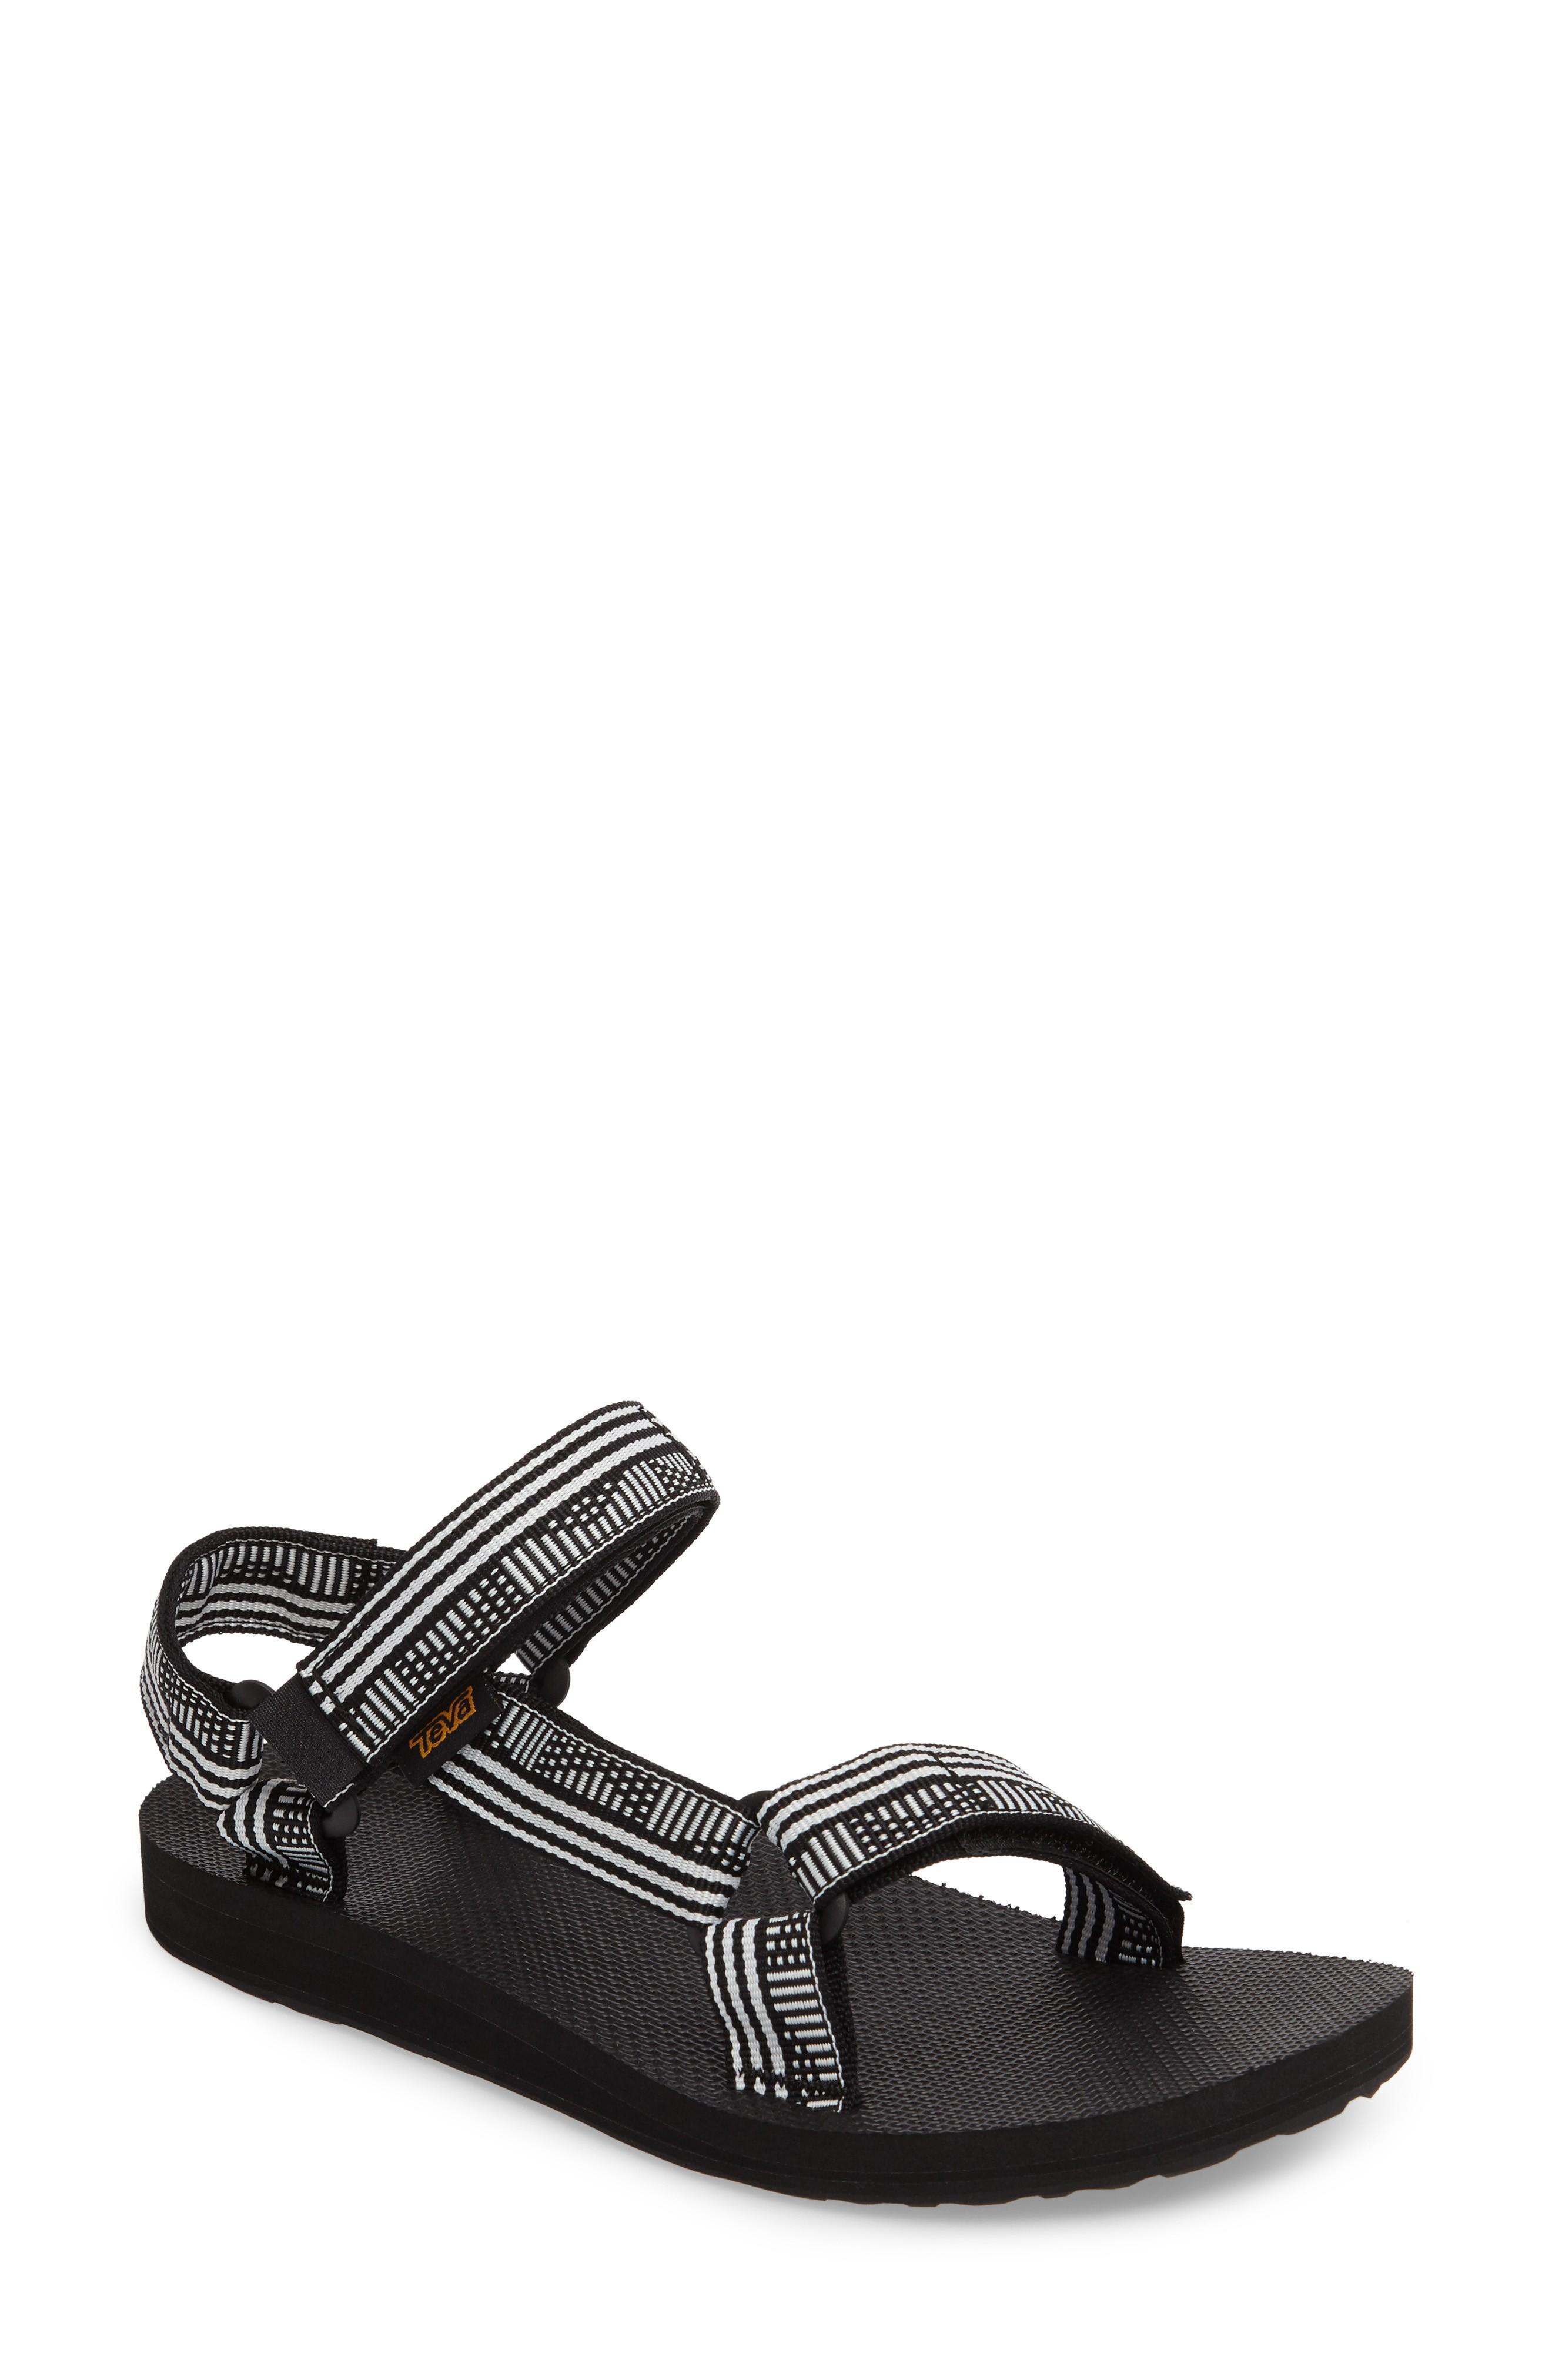 871c66157d8f98 Teva  Original Universal  Sandal In Campo Black  White Fabric